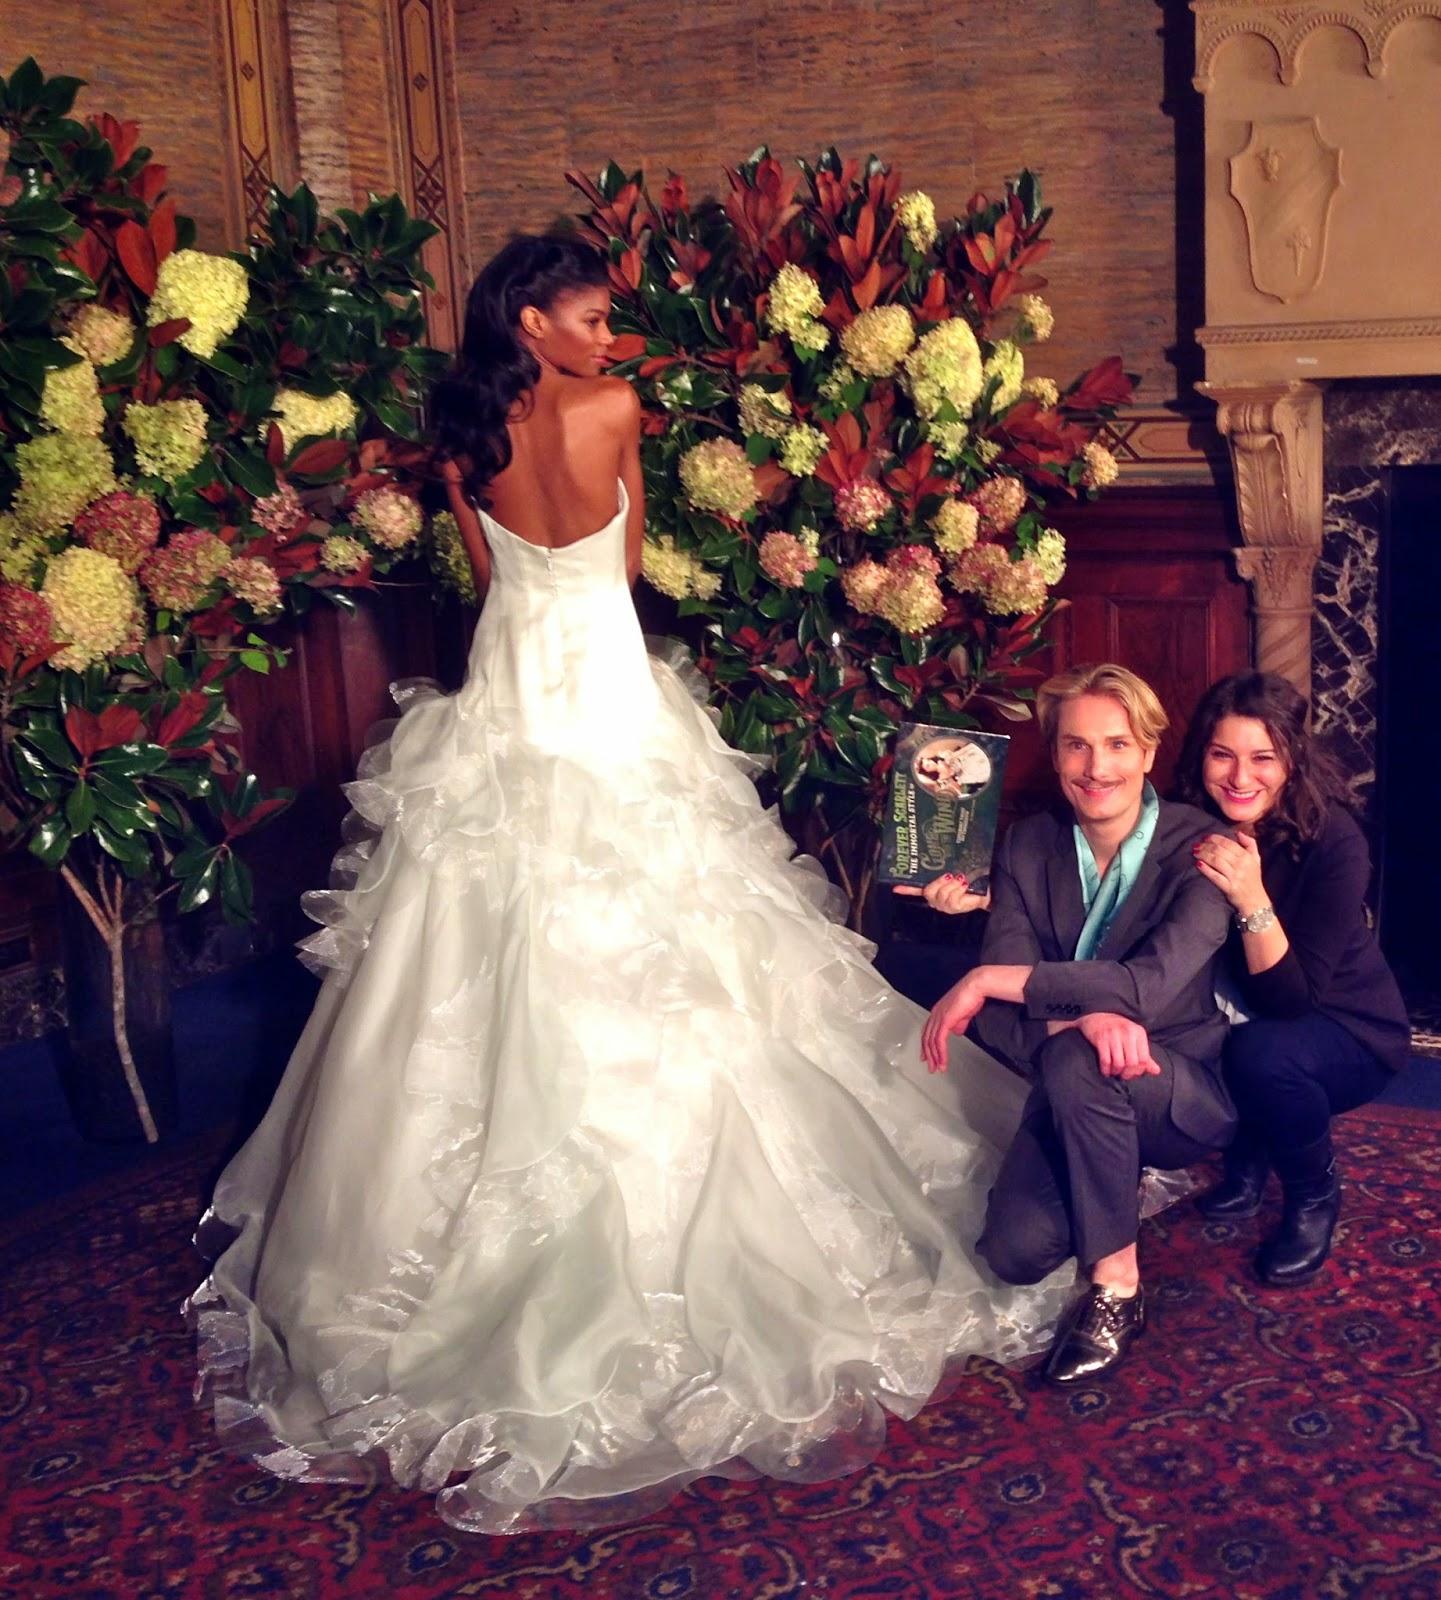 Austin Scarlett Wedding Gowns: The Original Project Runway Fan Blog